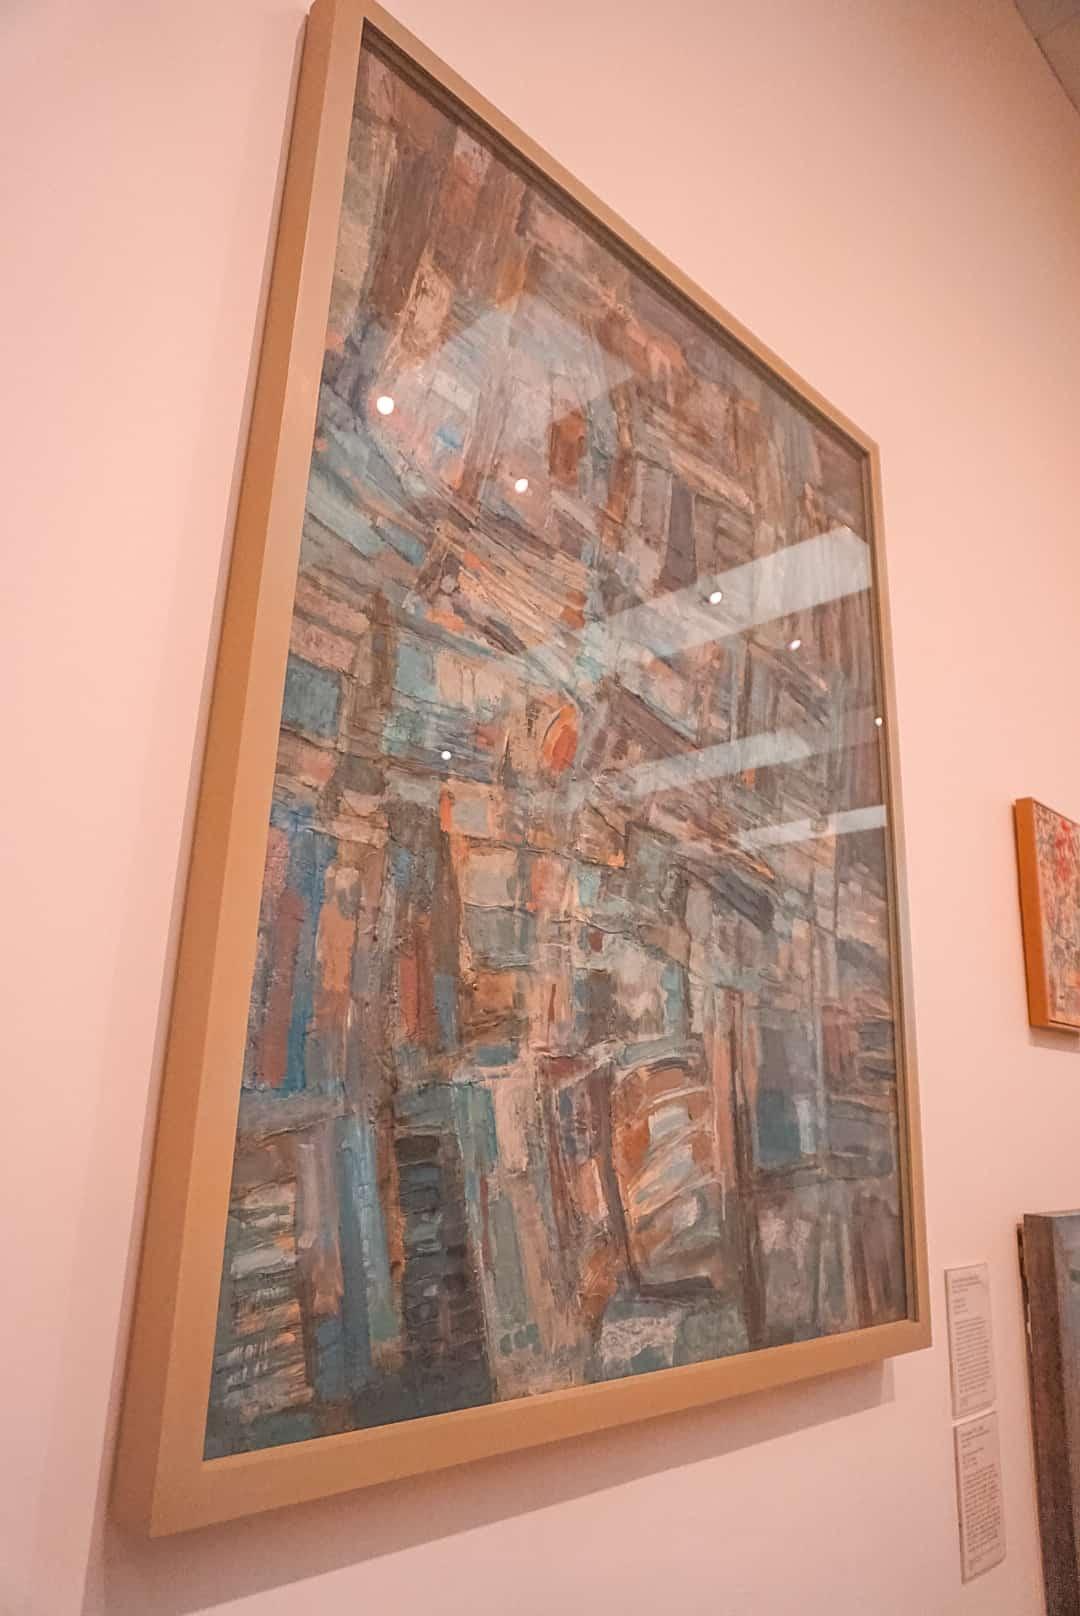 Modern-Art-in-London-Painting-Tate-Museum